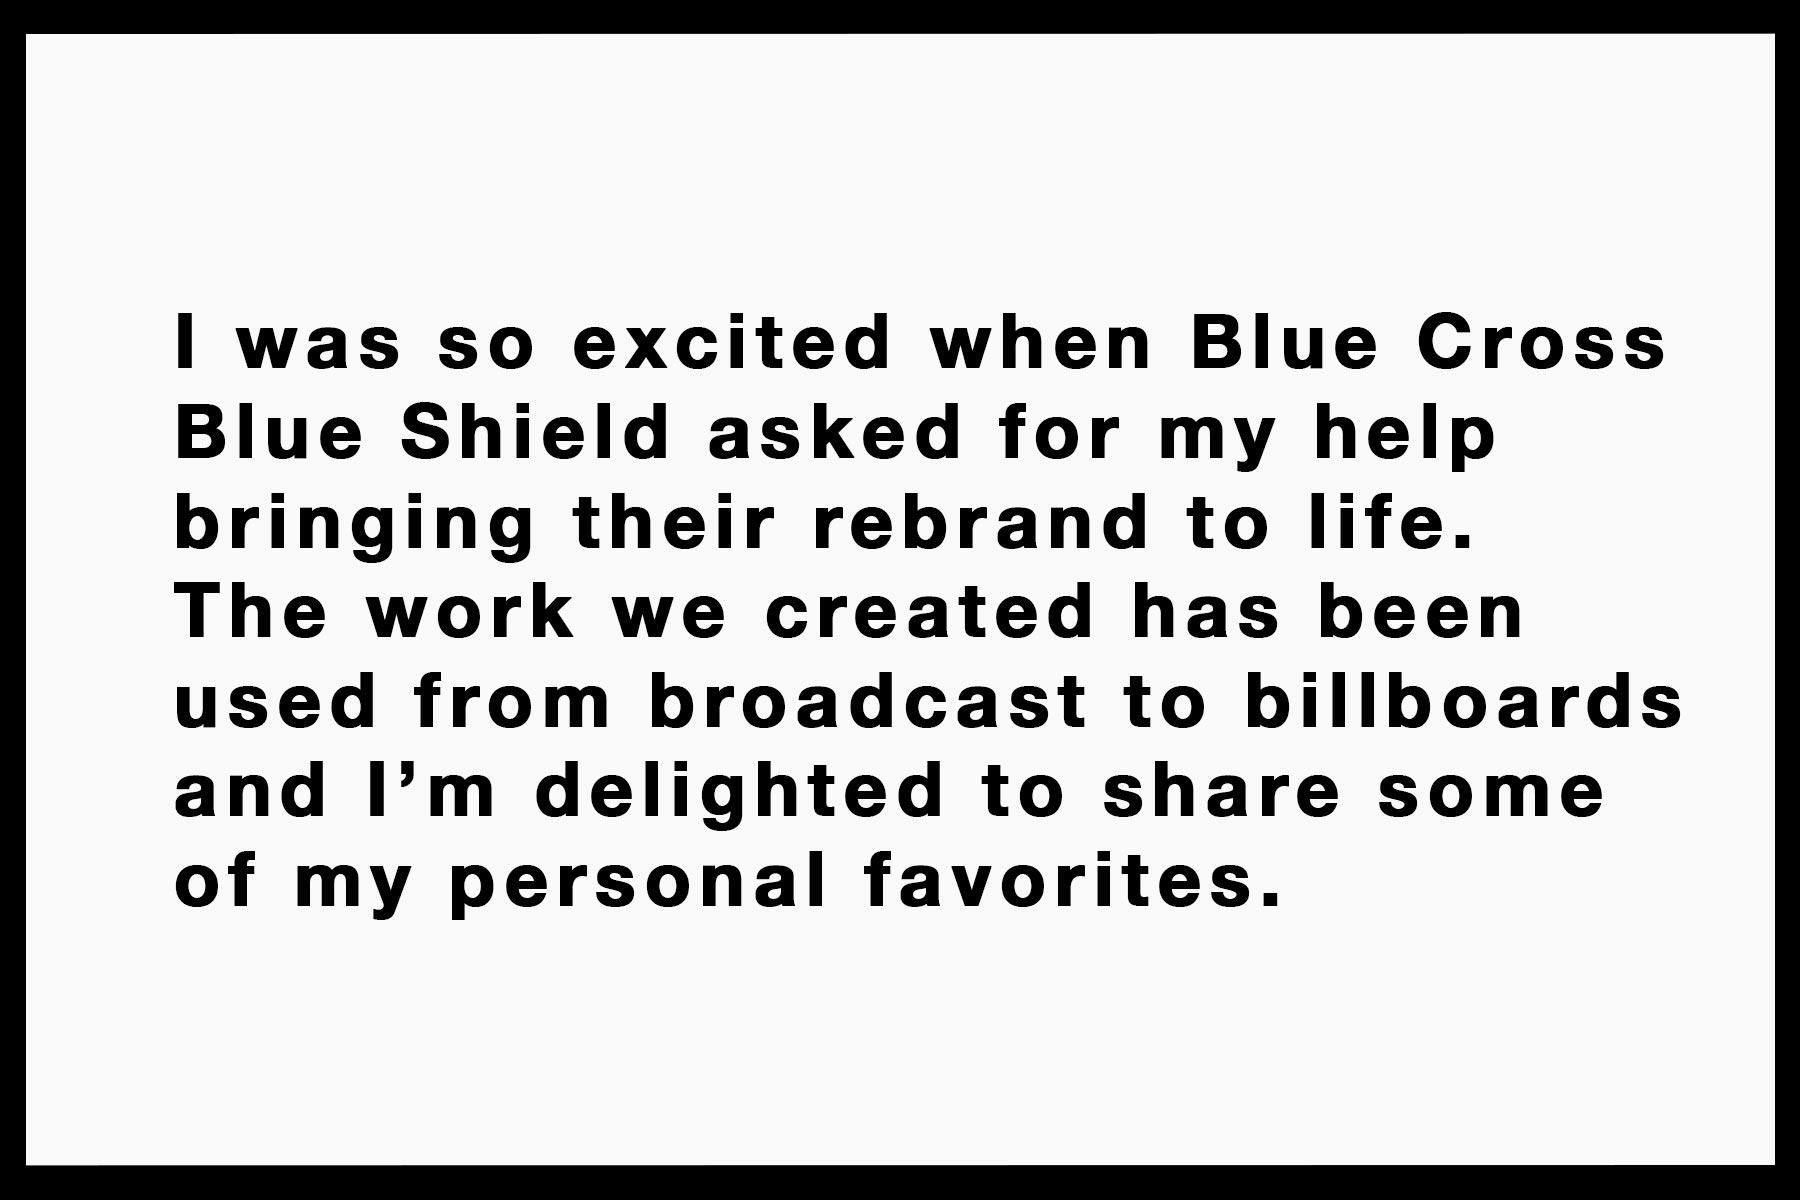 Case Study: Blue Cross Blue Shield, Lisa Wiseman, Photographer. At-Edge